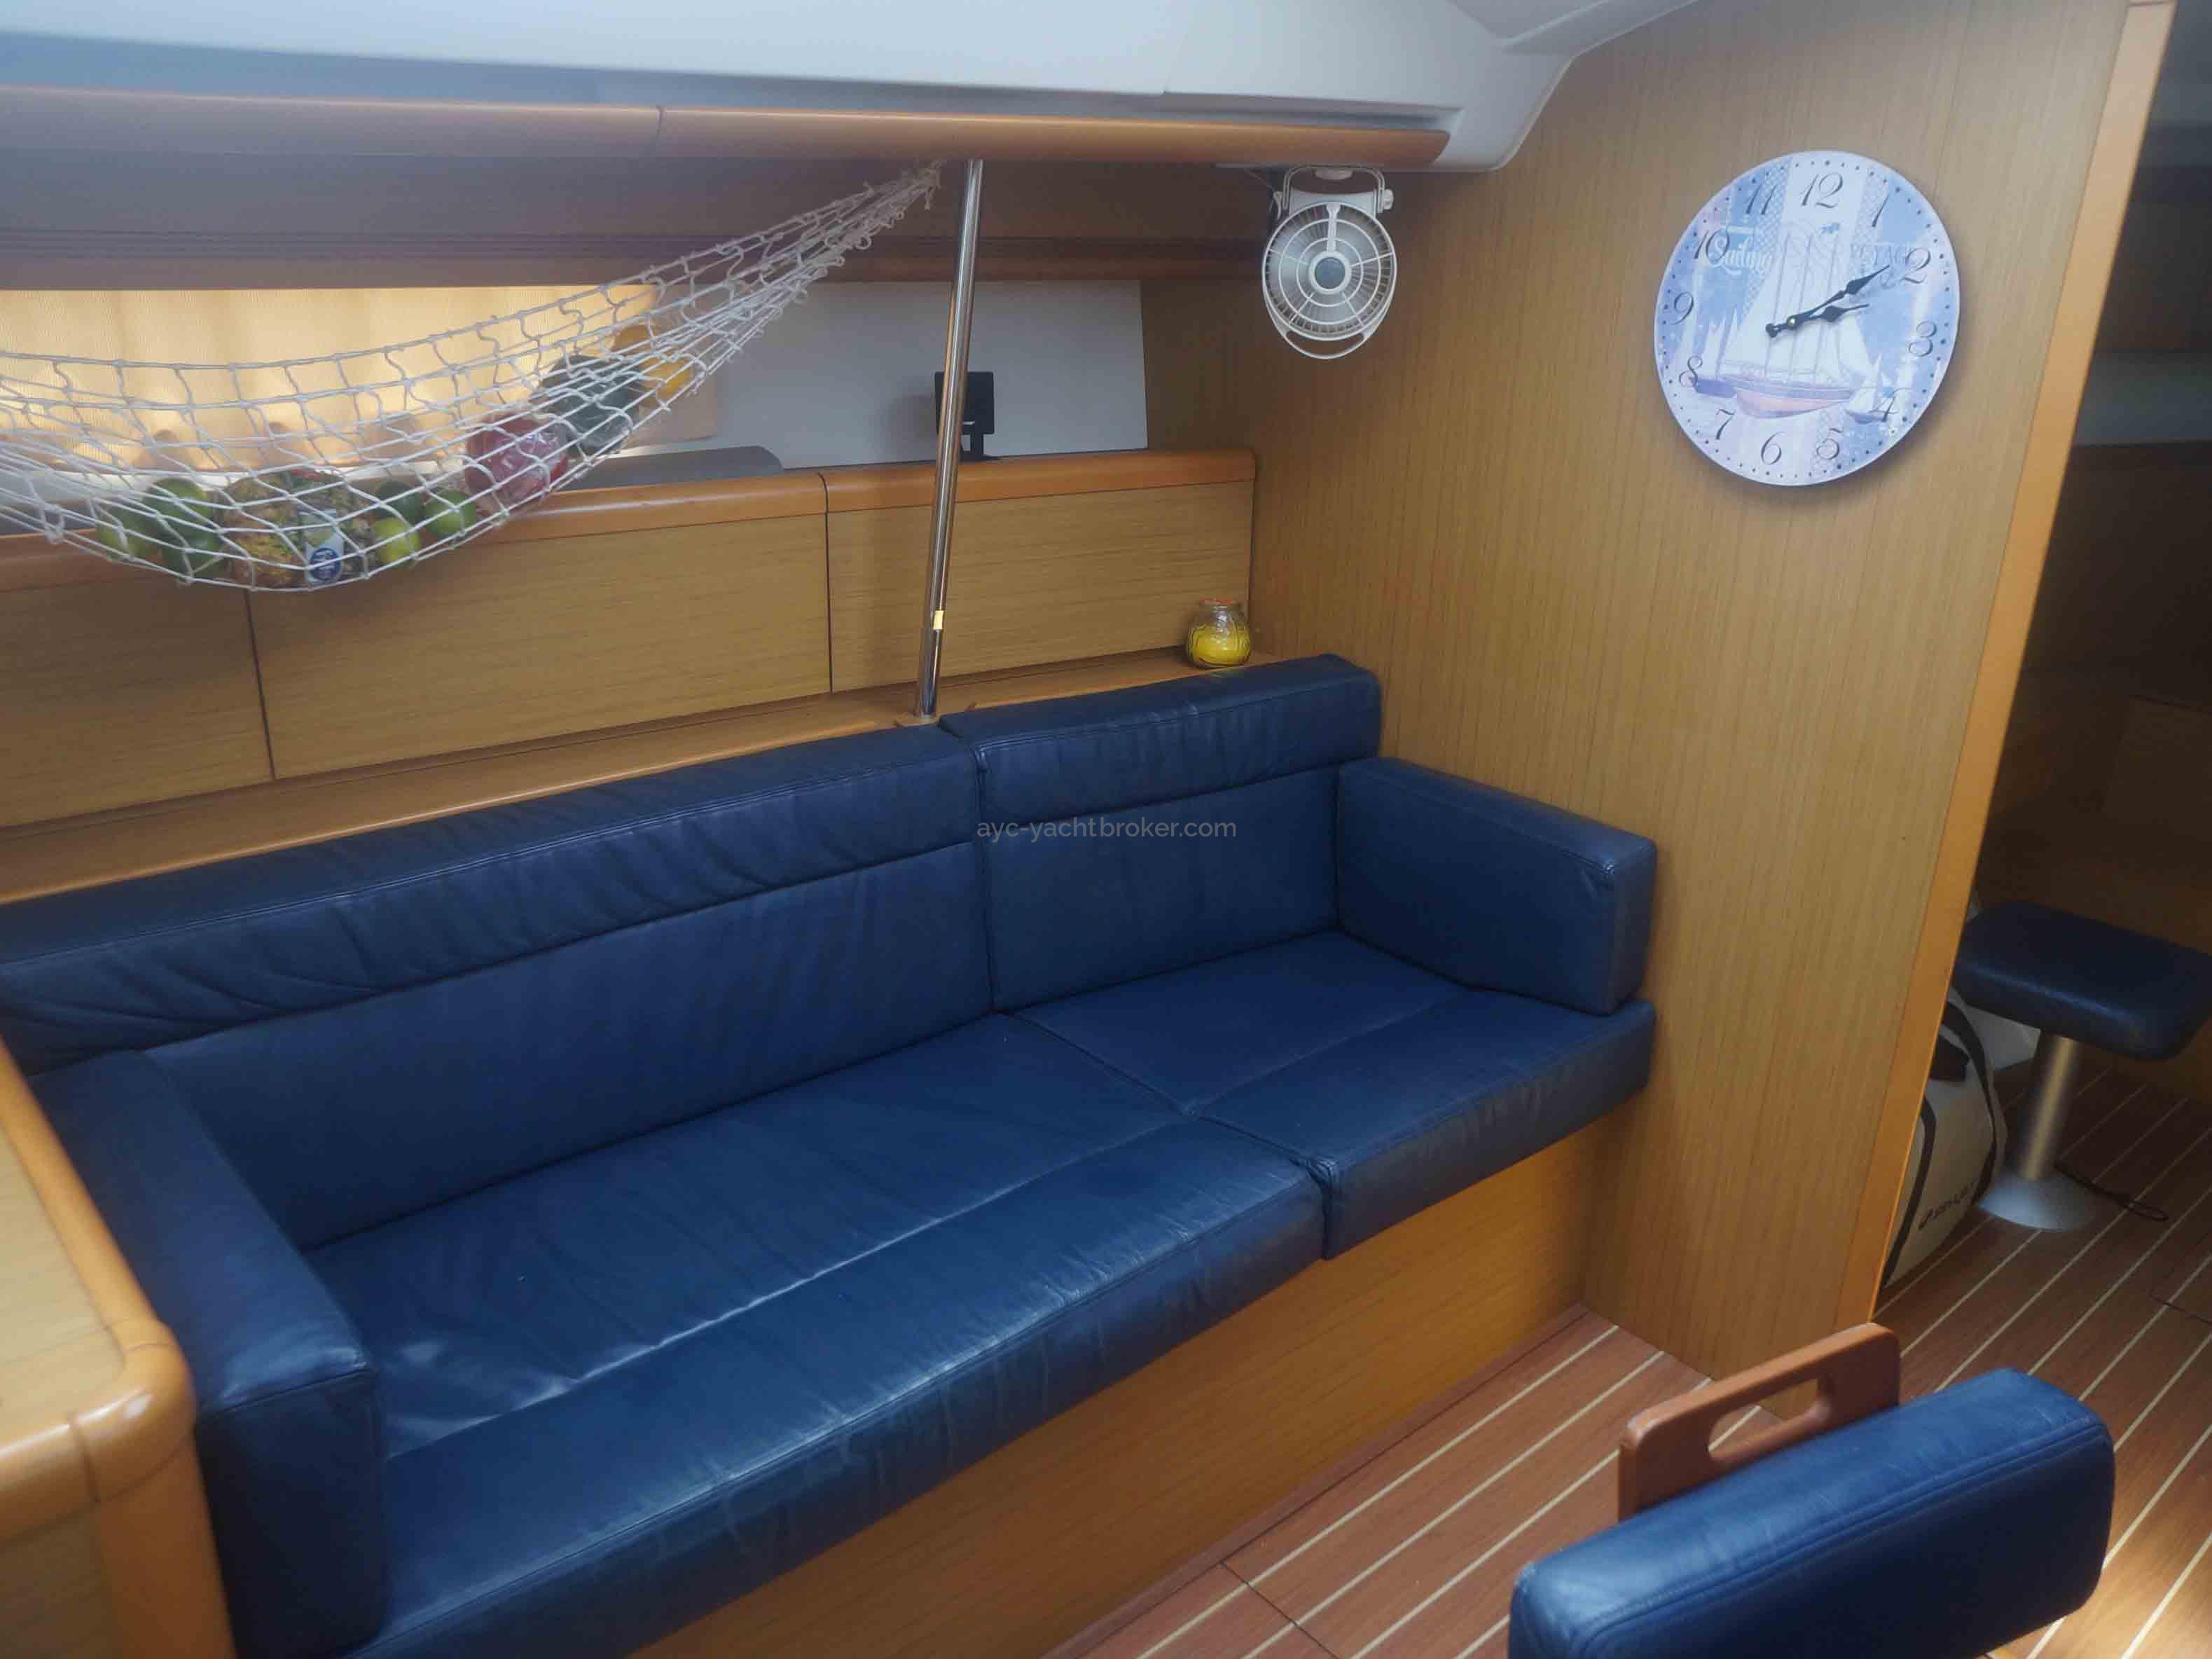 AYC - Yacht broker - SUN ODDYSEY 50 DS PERFORMANCE